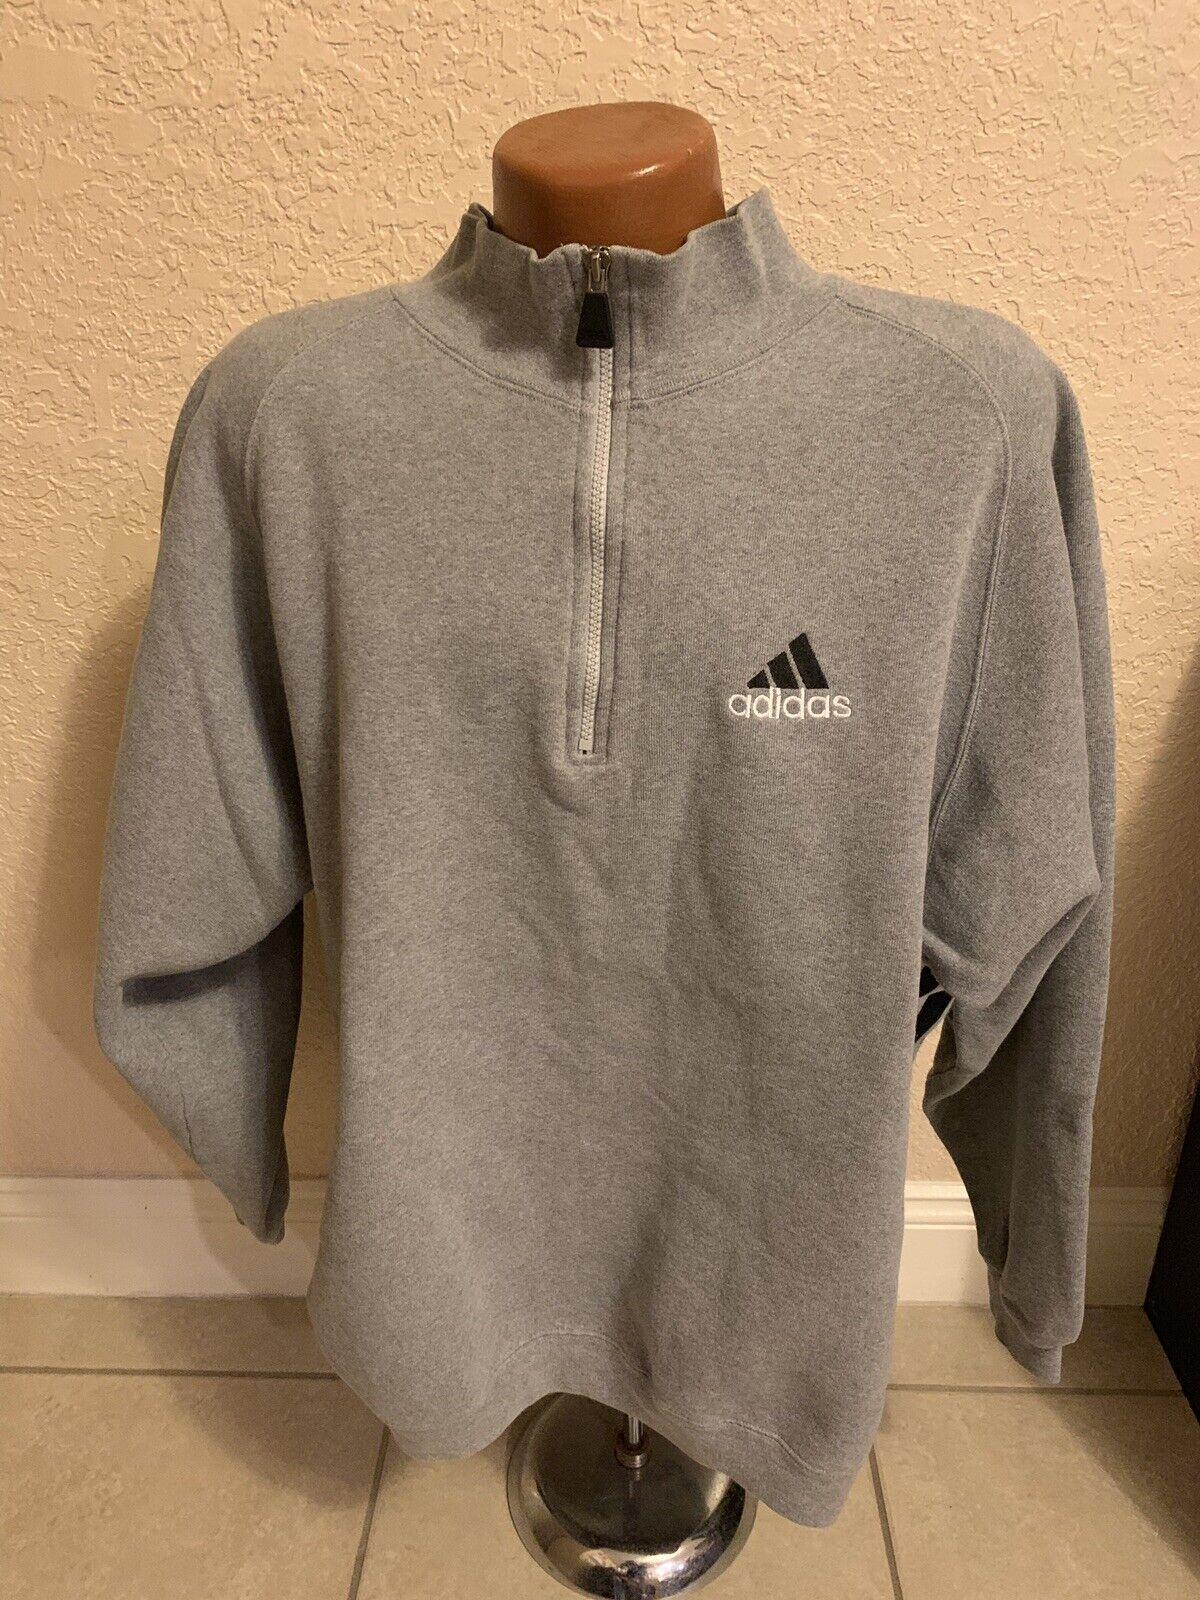 Vintage Adidas Half Zip sweater fleece. Size 2XL. Good condition